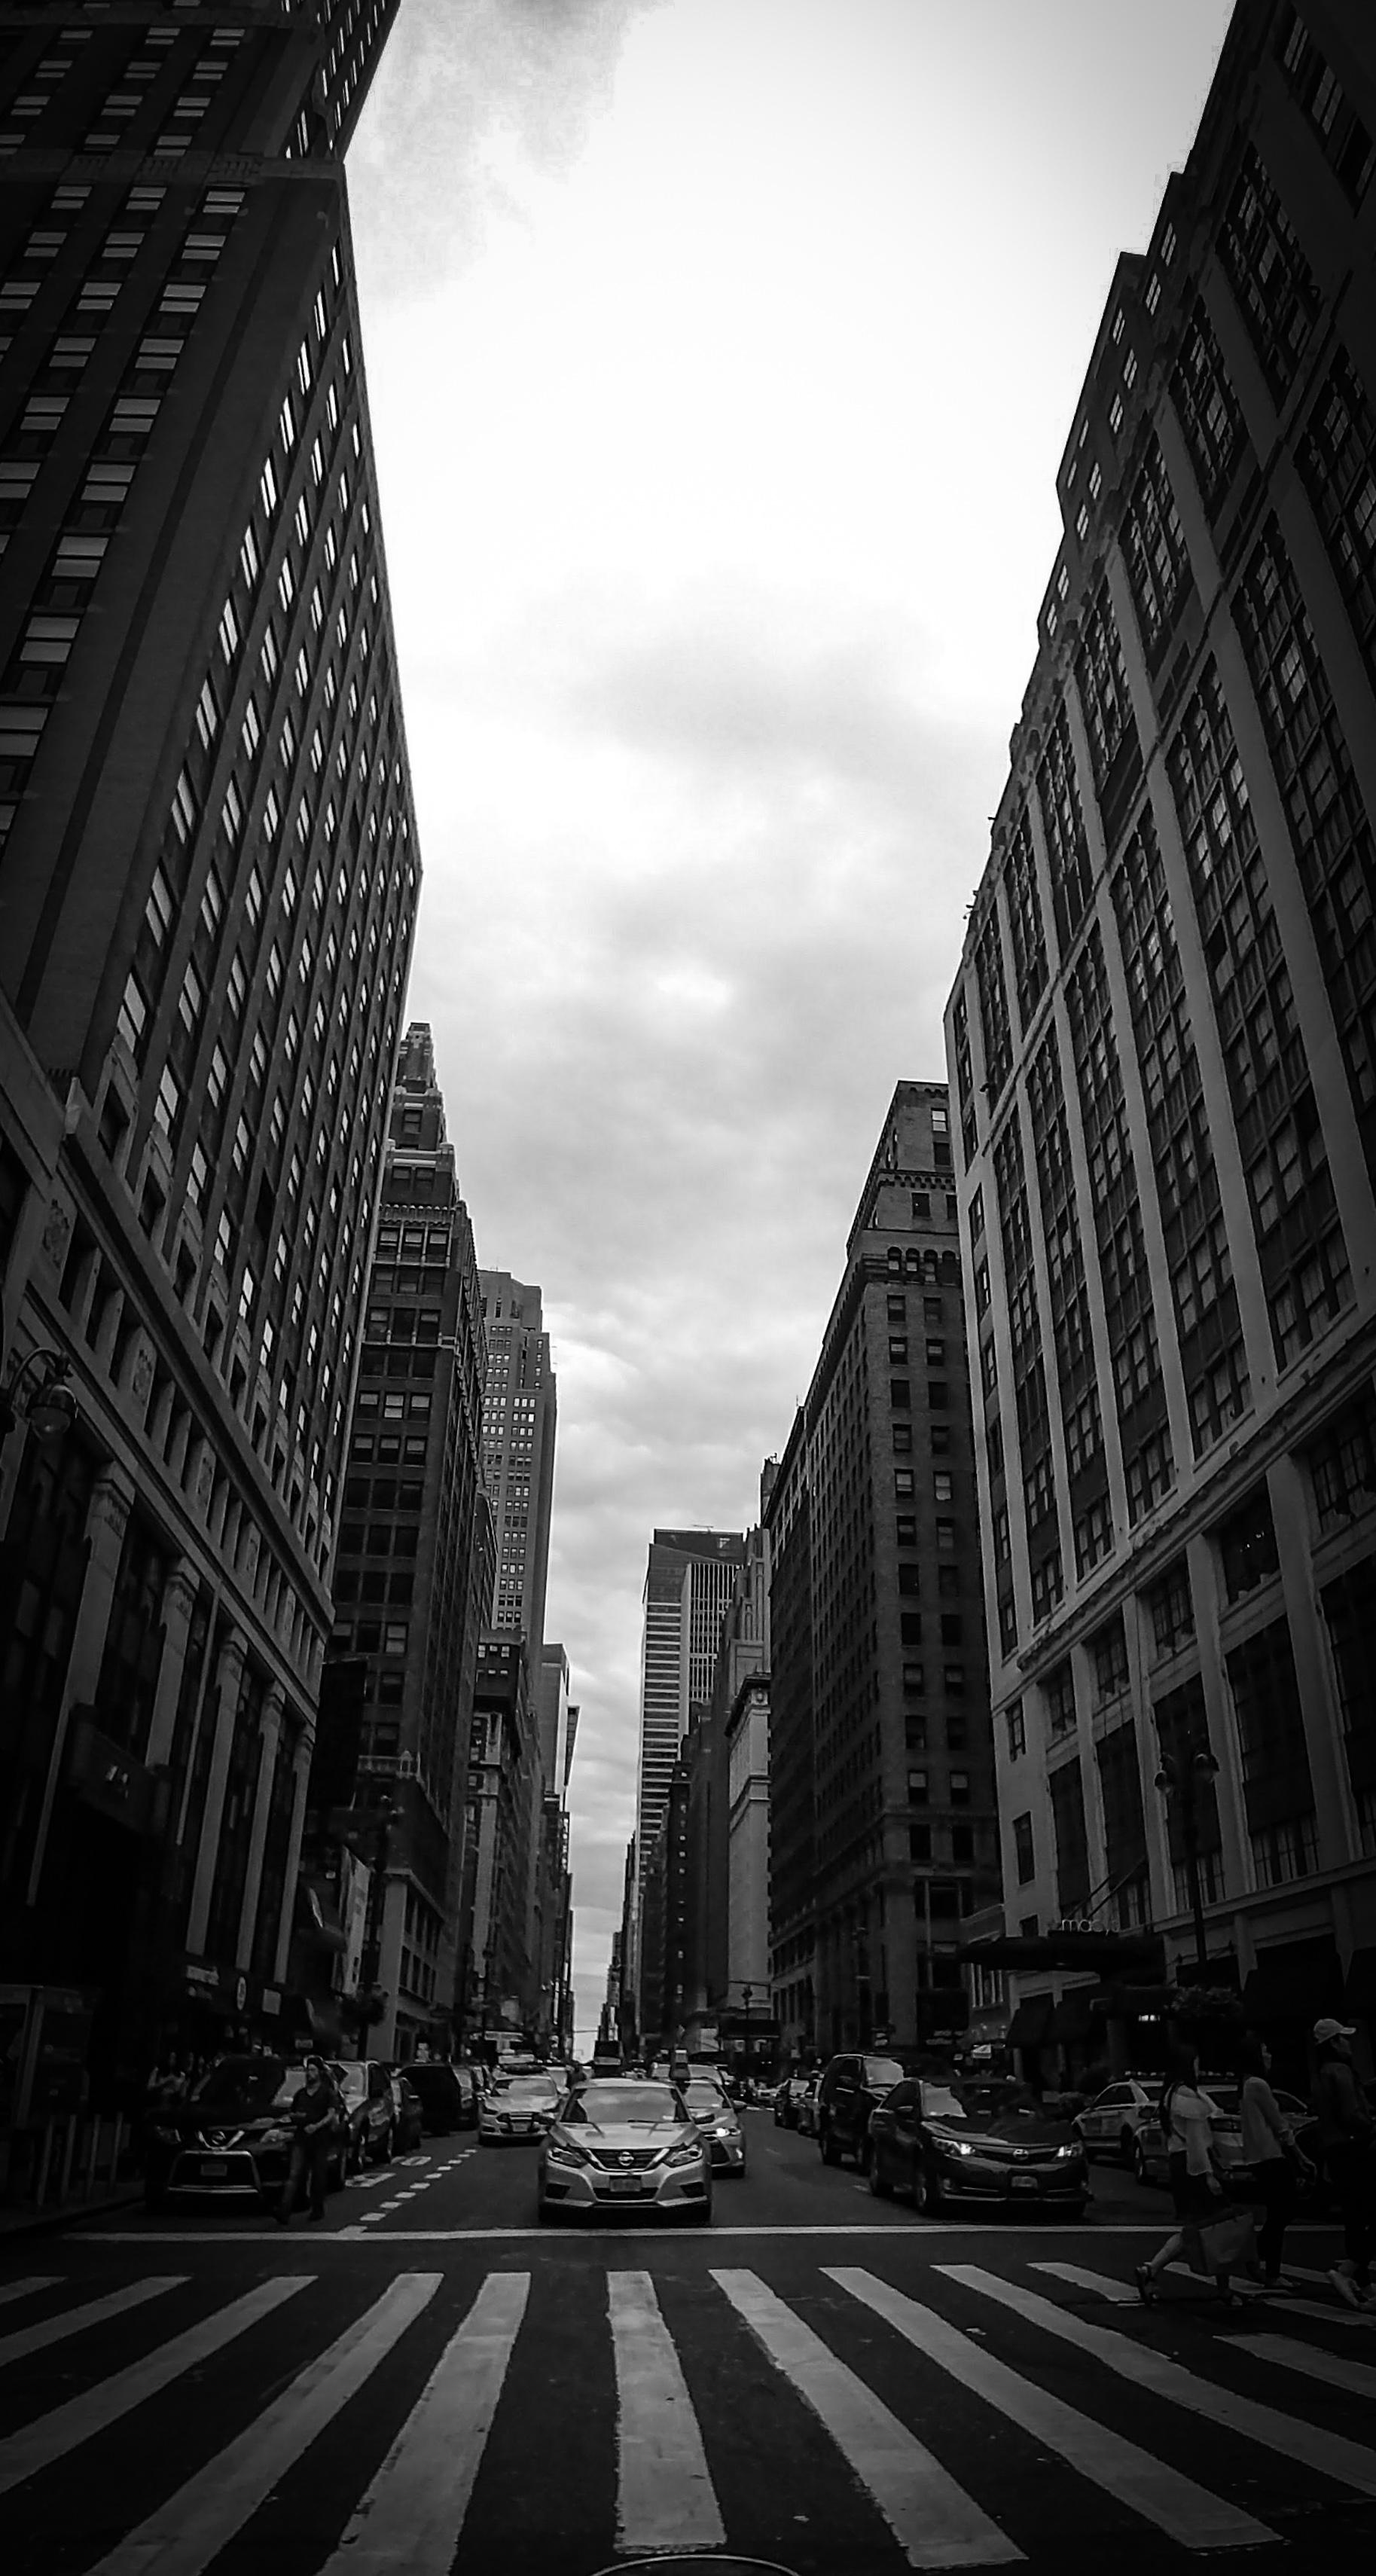 Wallpaper Perkotaan : wallpaper, perkotaan, Gratis, Tentang, Fotografi, Perkotaan,, Hitam, Putih,, Jalan